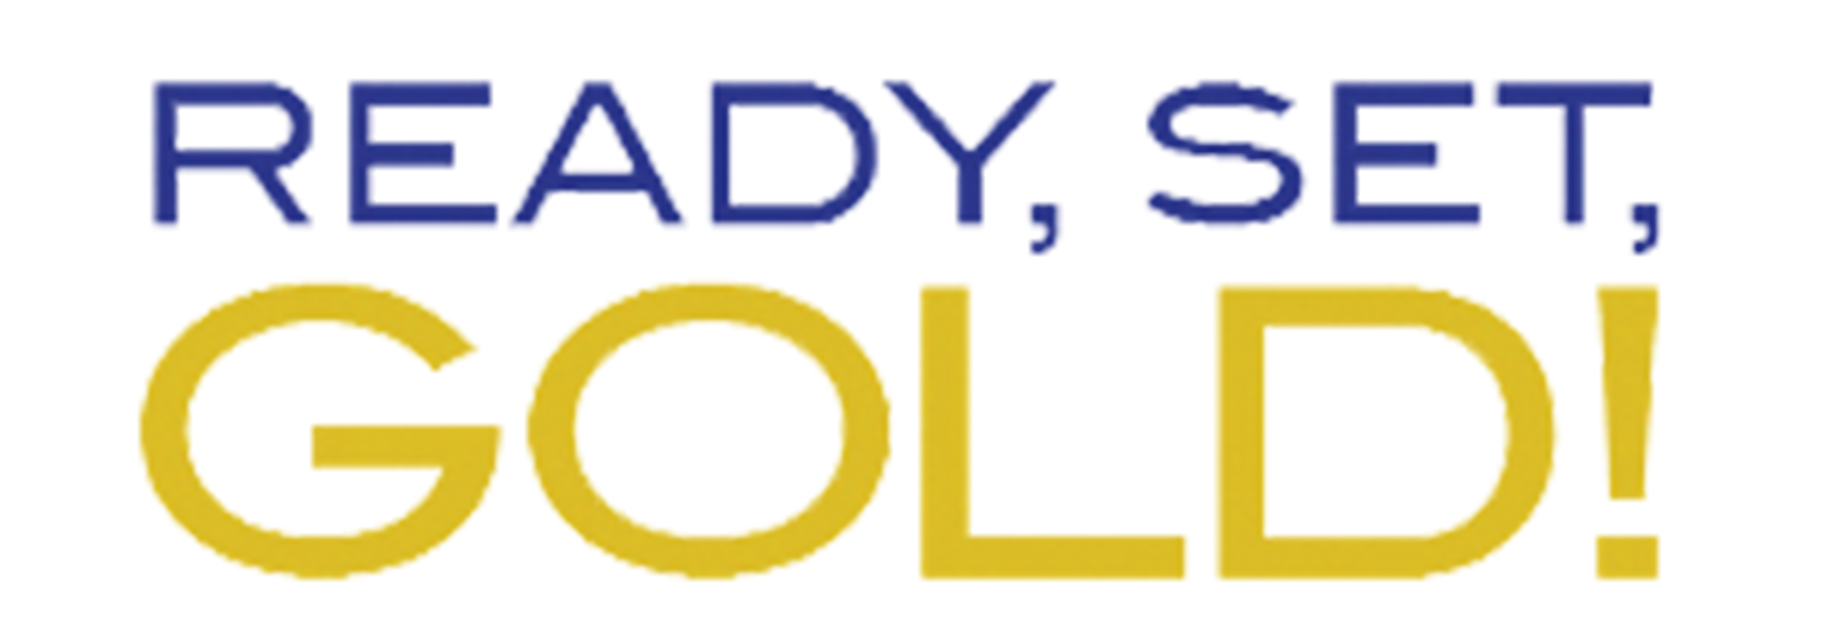 (c) Readysetgold.net